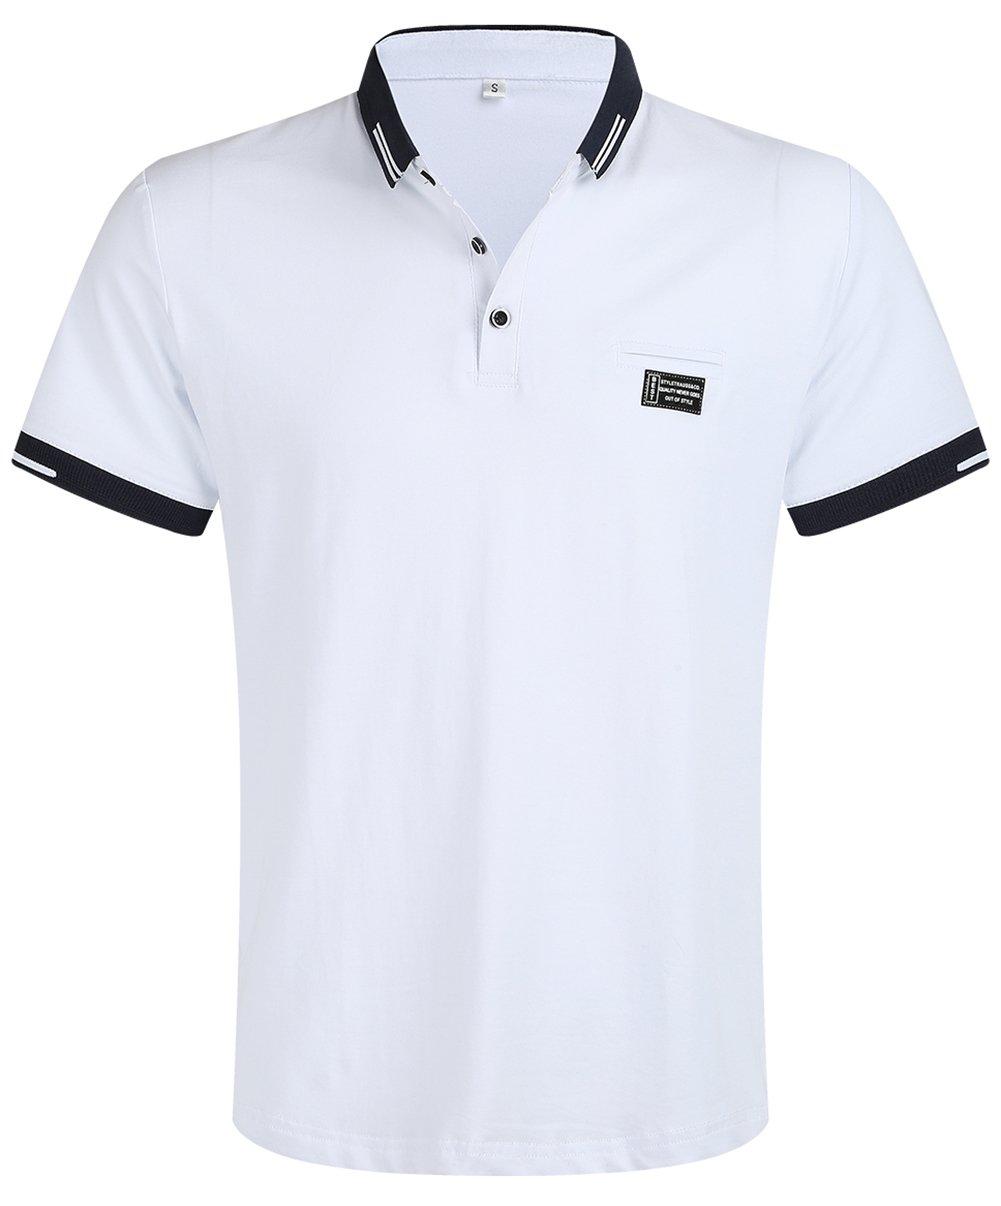 Musen Men Short Sleeve Polo Shirt Cotton Regular Fit T-Shirts White L